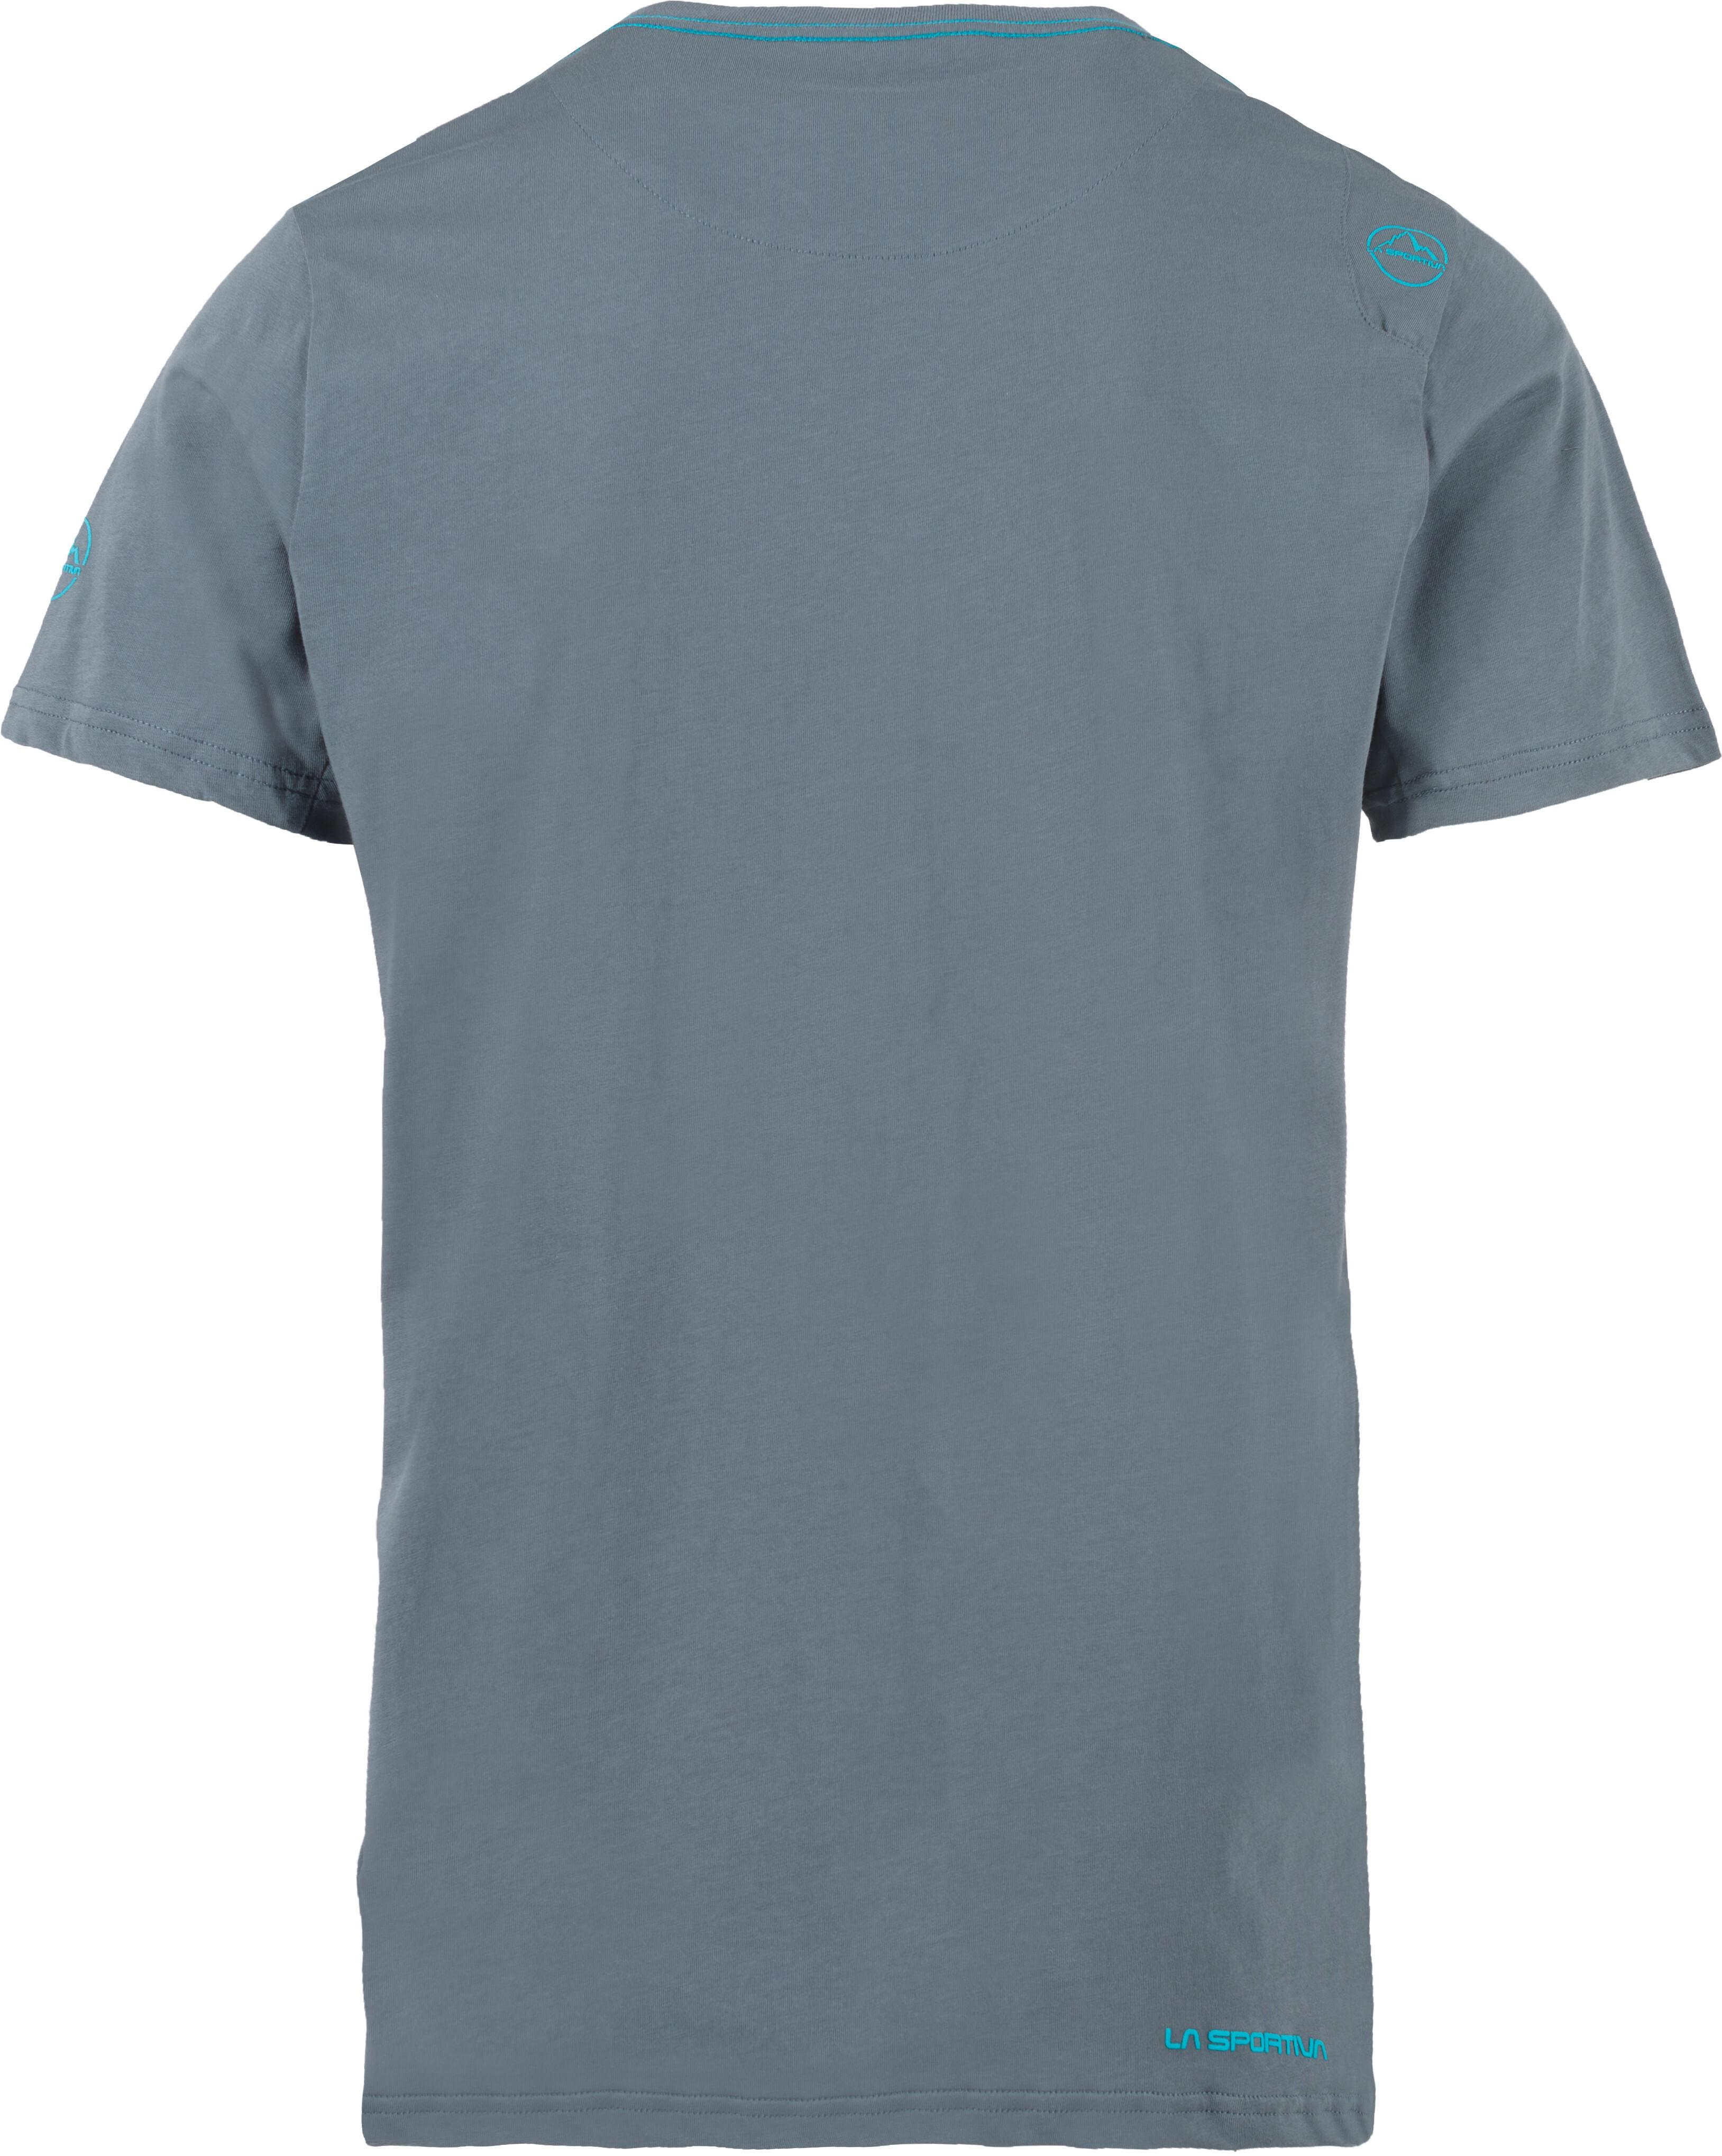 La Sportiva Mens Hipster T-Shirt Casual T-Shirts